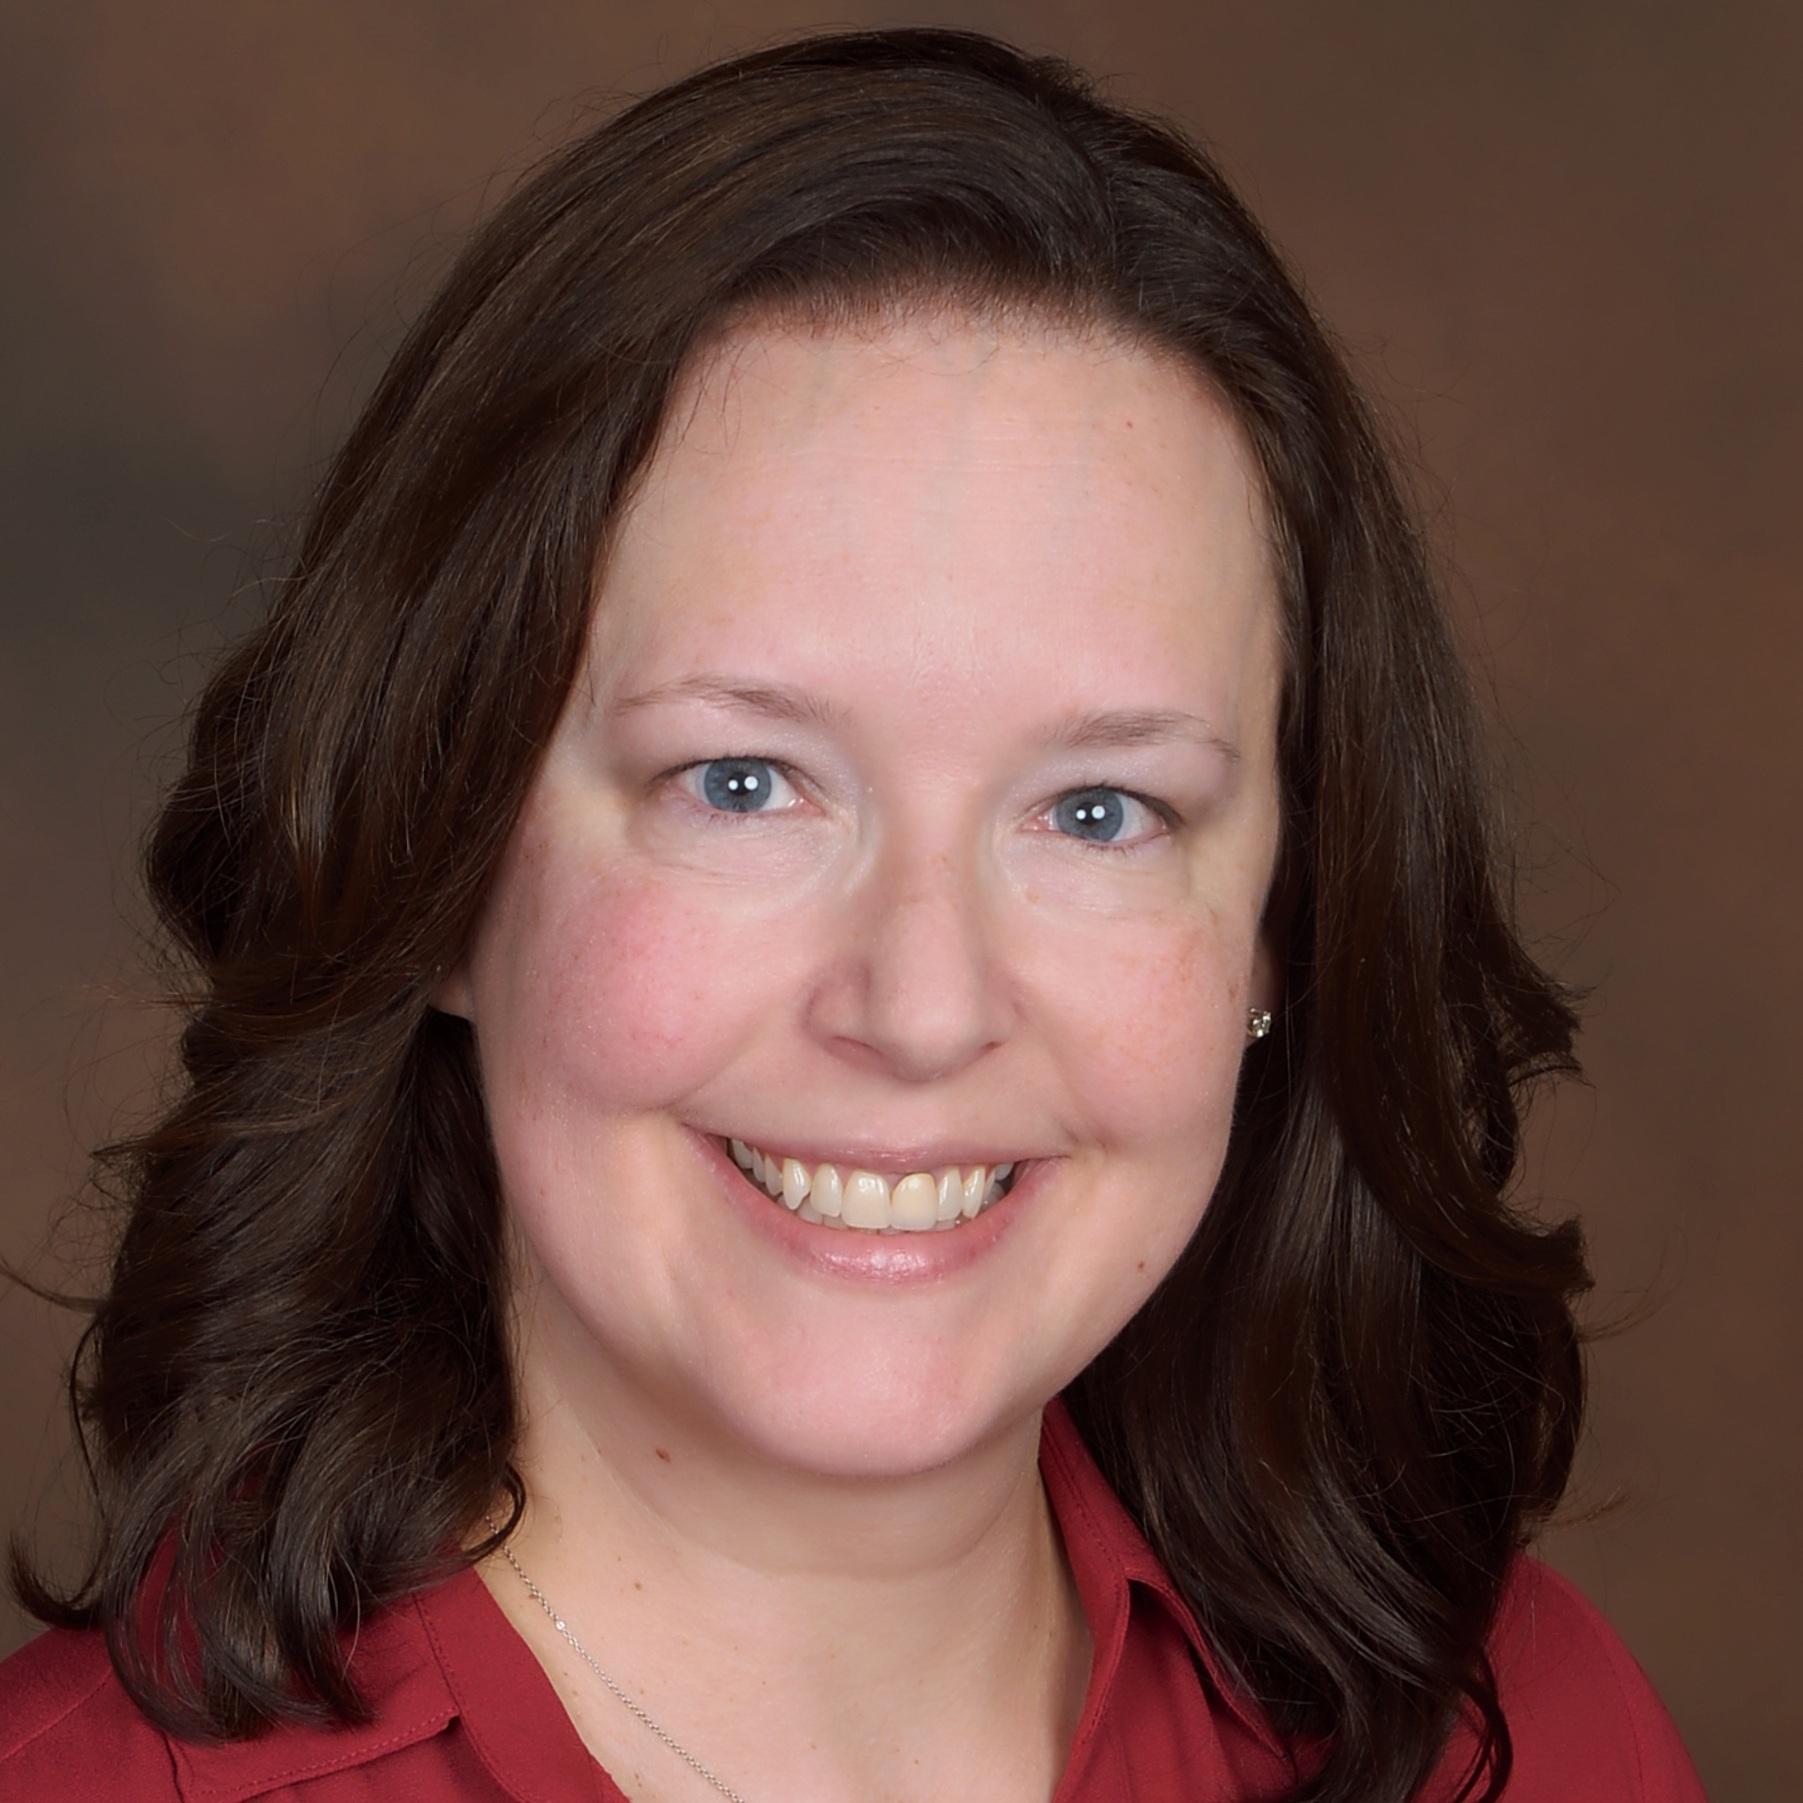 Mitzi Clark, DVM, DACVD - Assistant Clinical Professor, Dermatology, Cornell University College of Veterinary Medicine